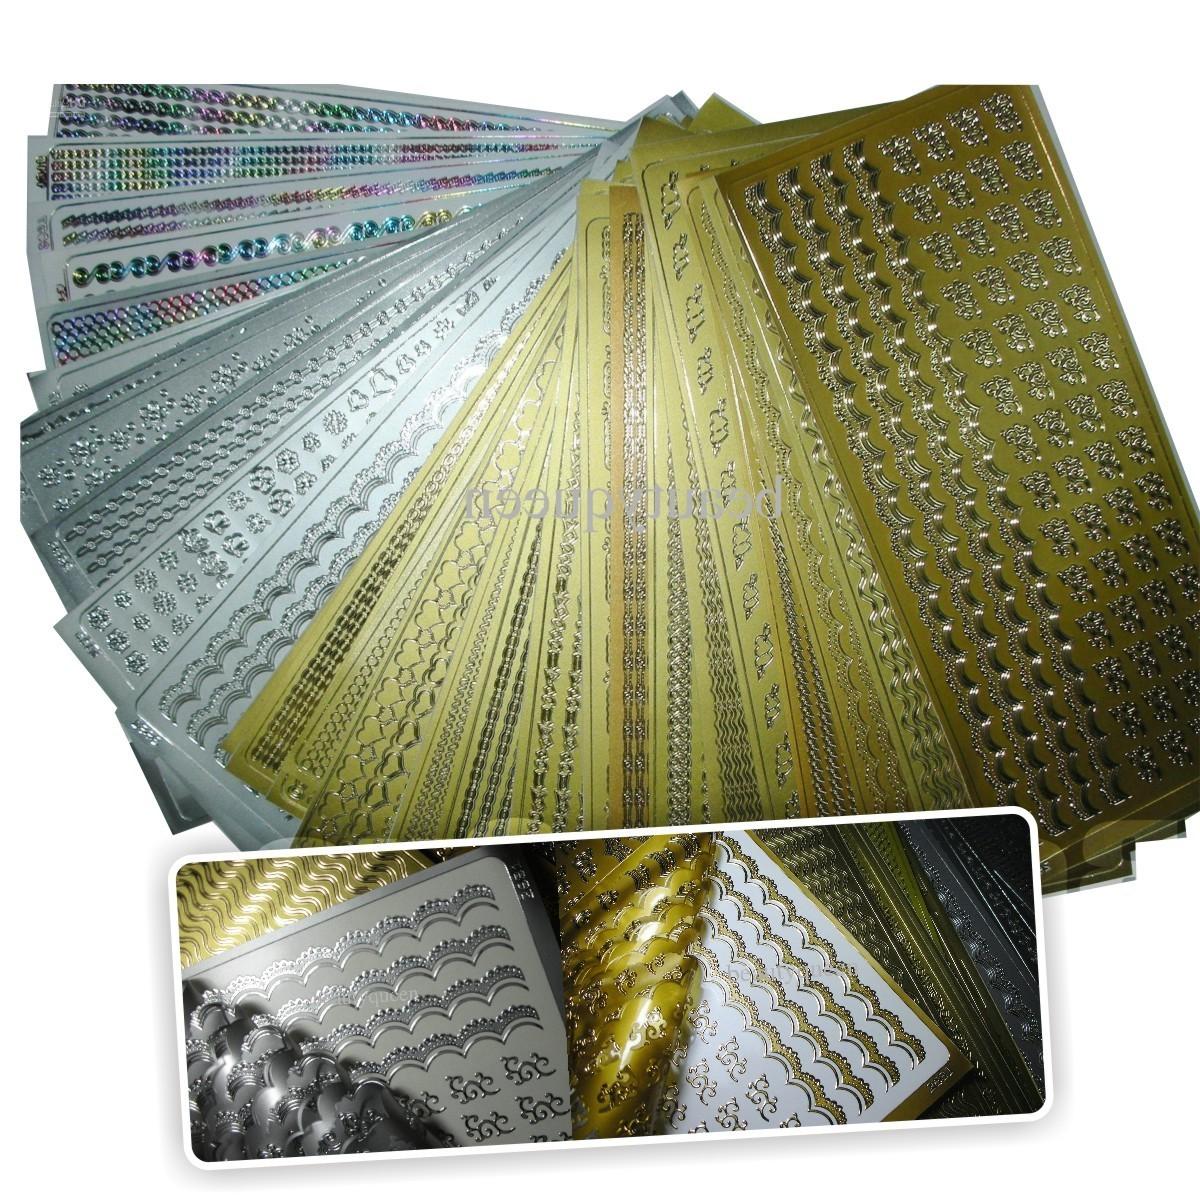 Kit Texturas 3D Metal Bordes y aplicativos adhesivos Nail Art Salon